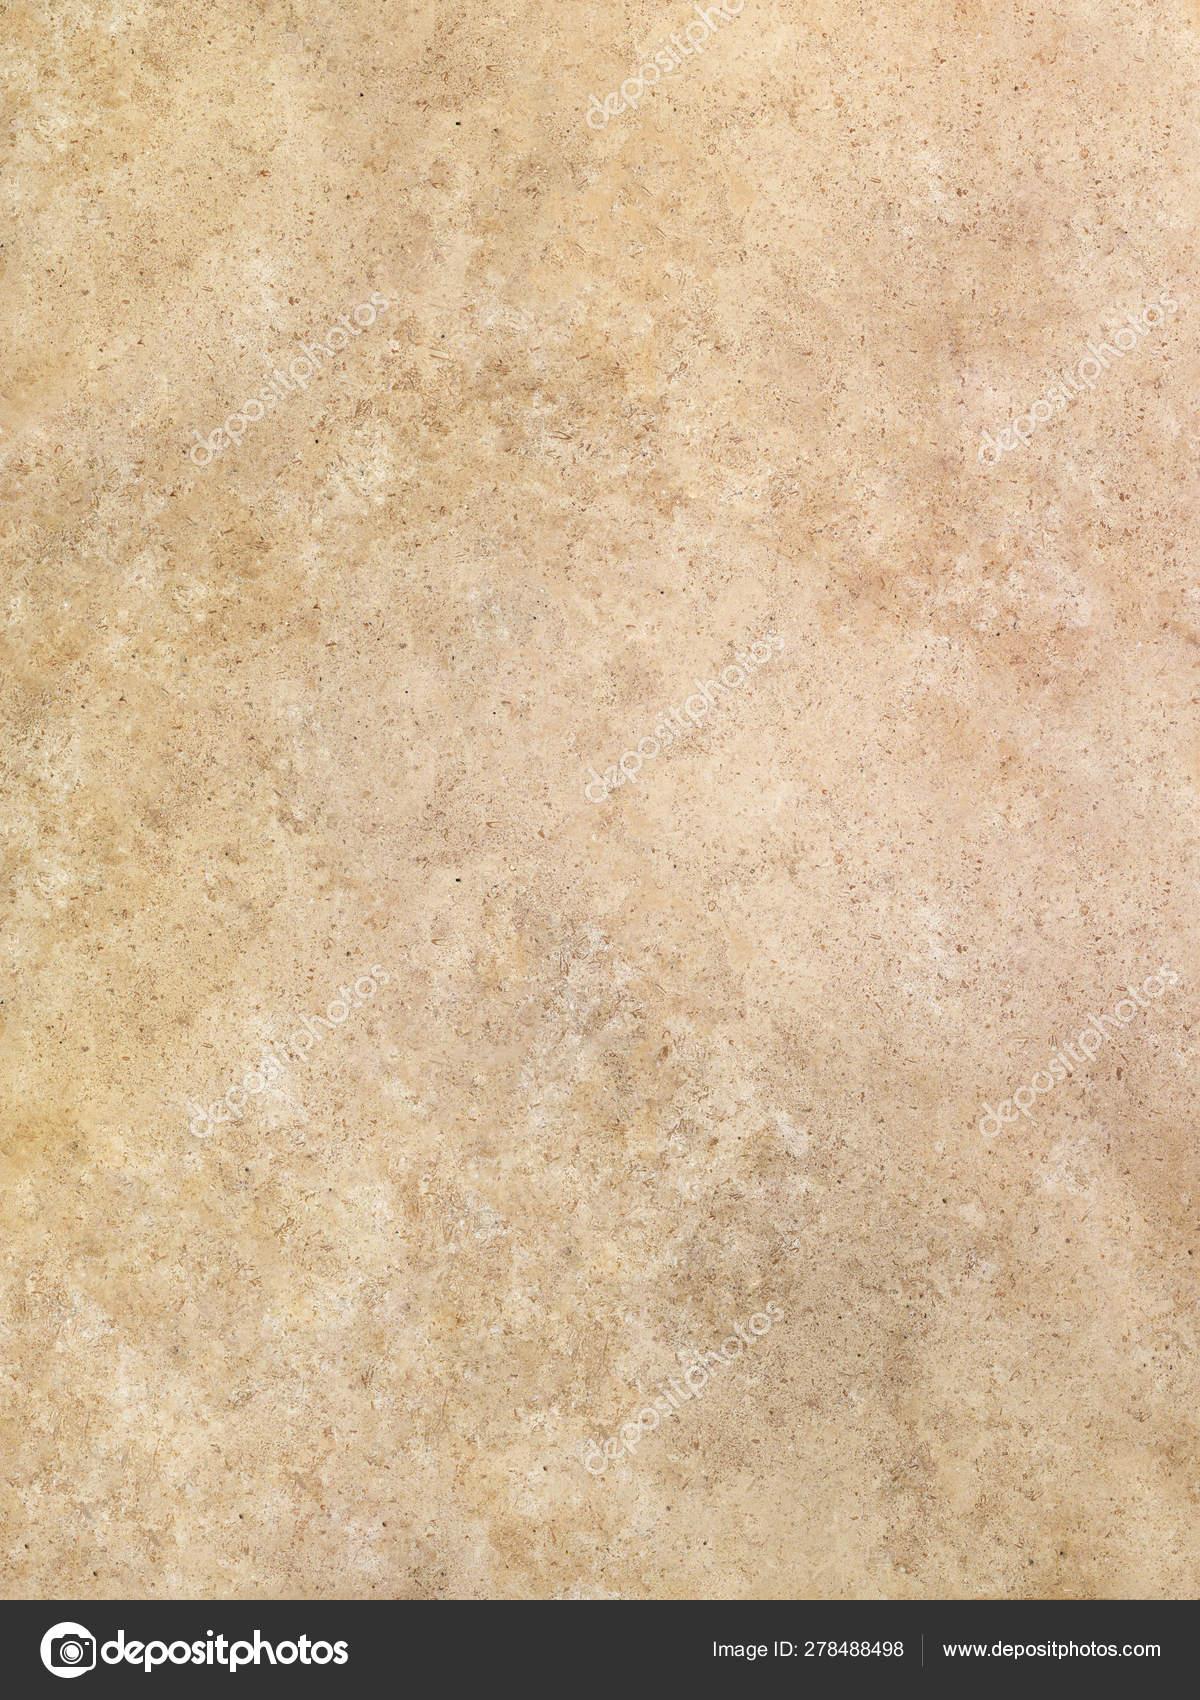 Tan Travertine Marble Surface Texture Stock Photo C Mwiens 278488498